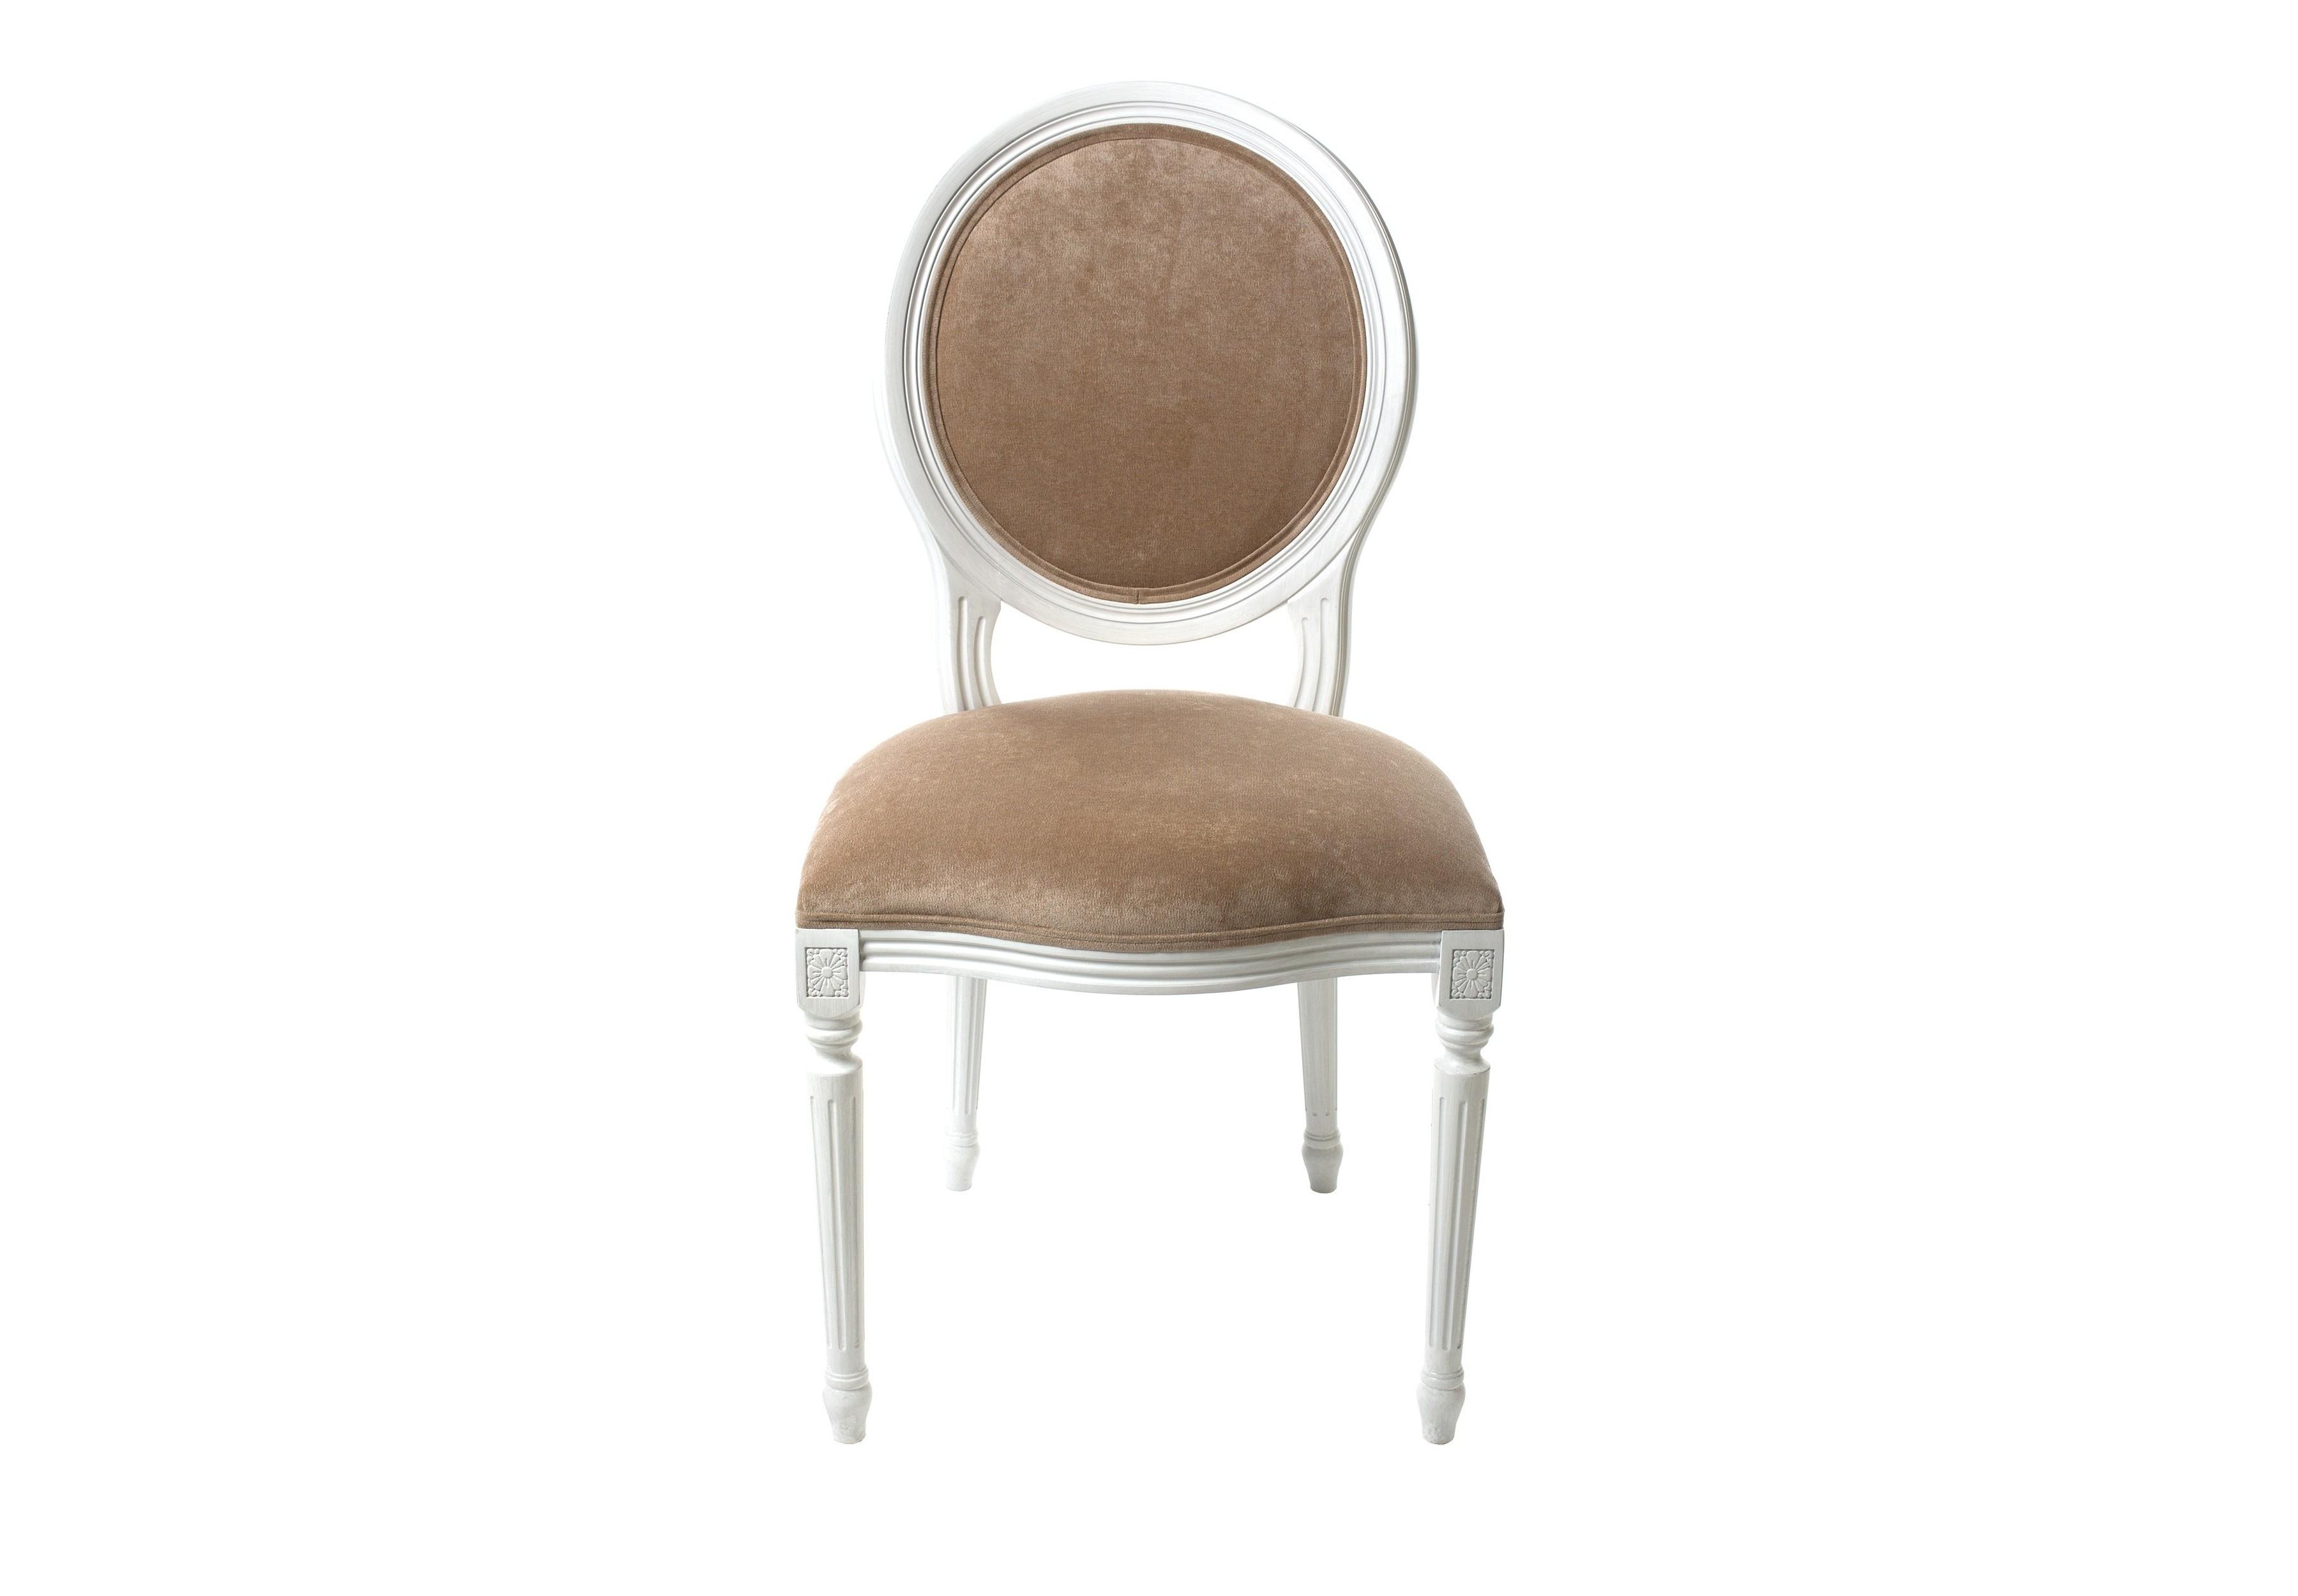 Кухонный стул La Neige 15443613 от thefurnish